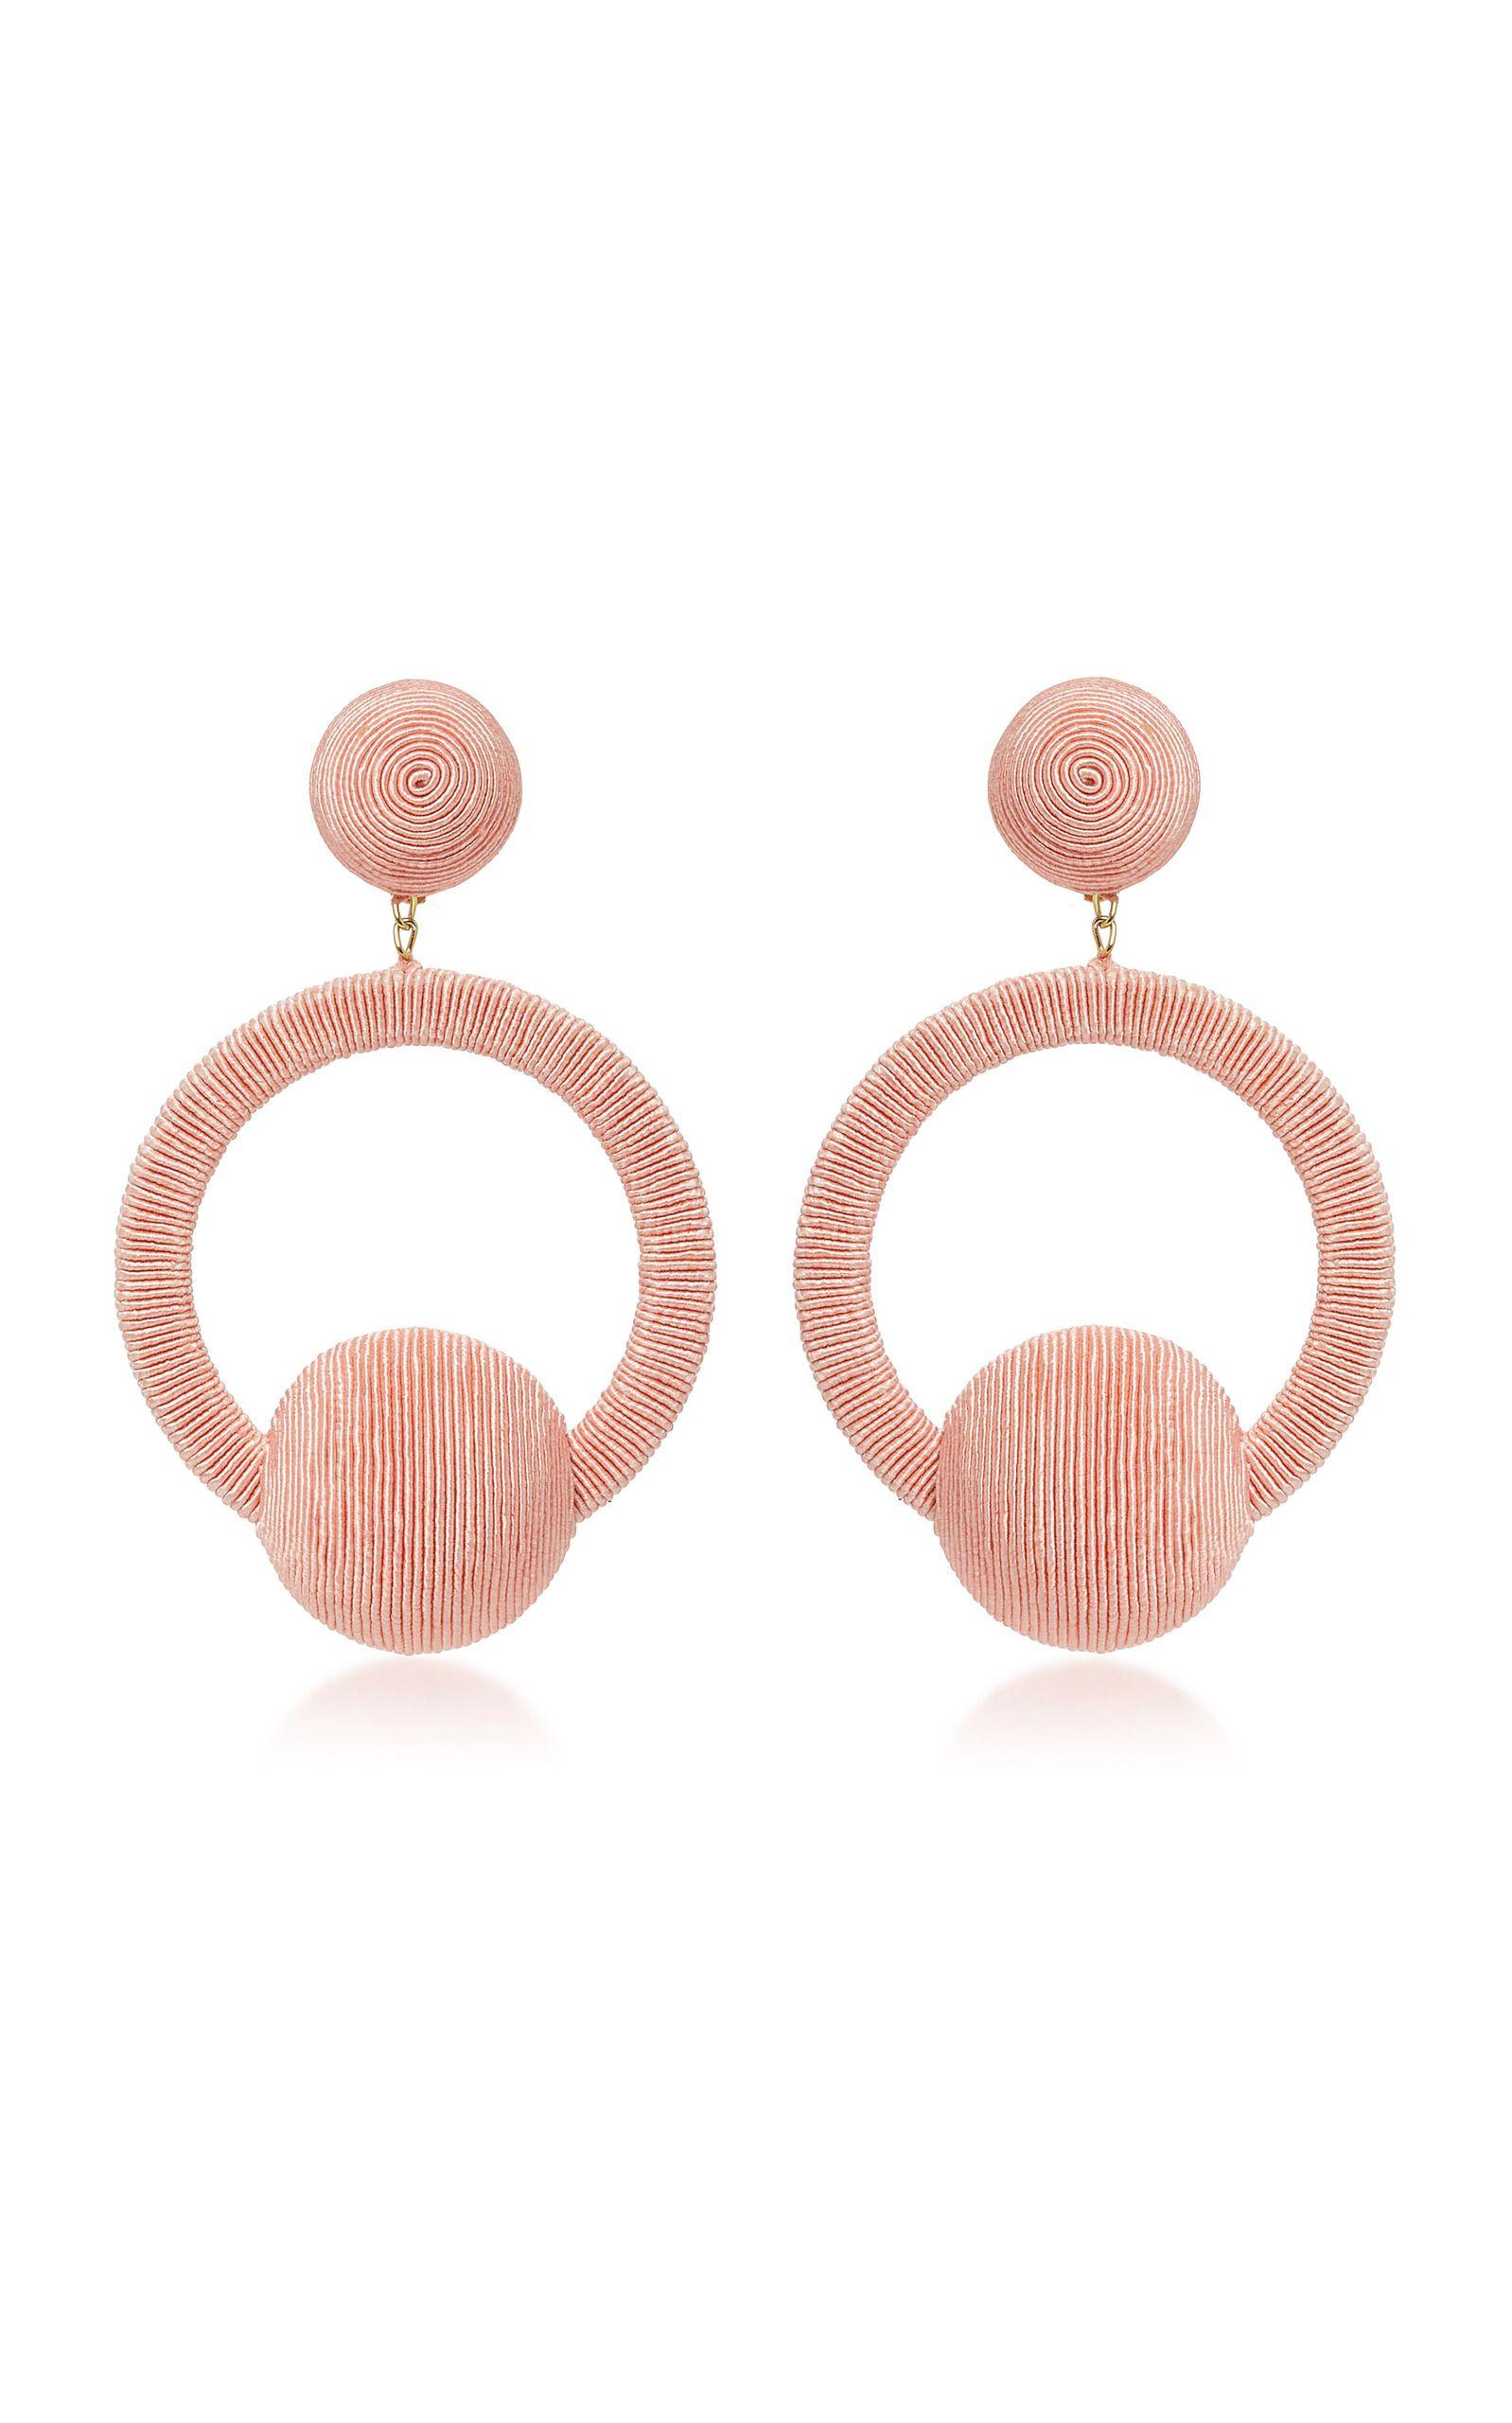 299612c8910c2 Love these light pink Rebecca de Ravenel Laeticia Hoop Lala Earrings ...